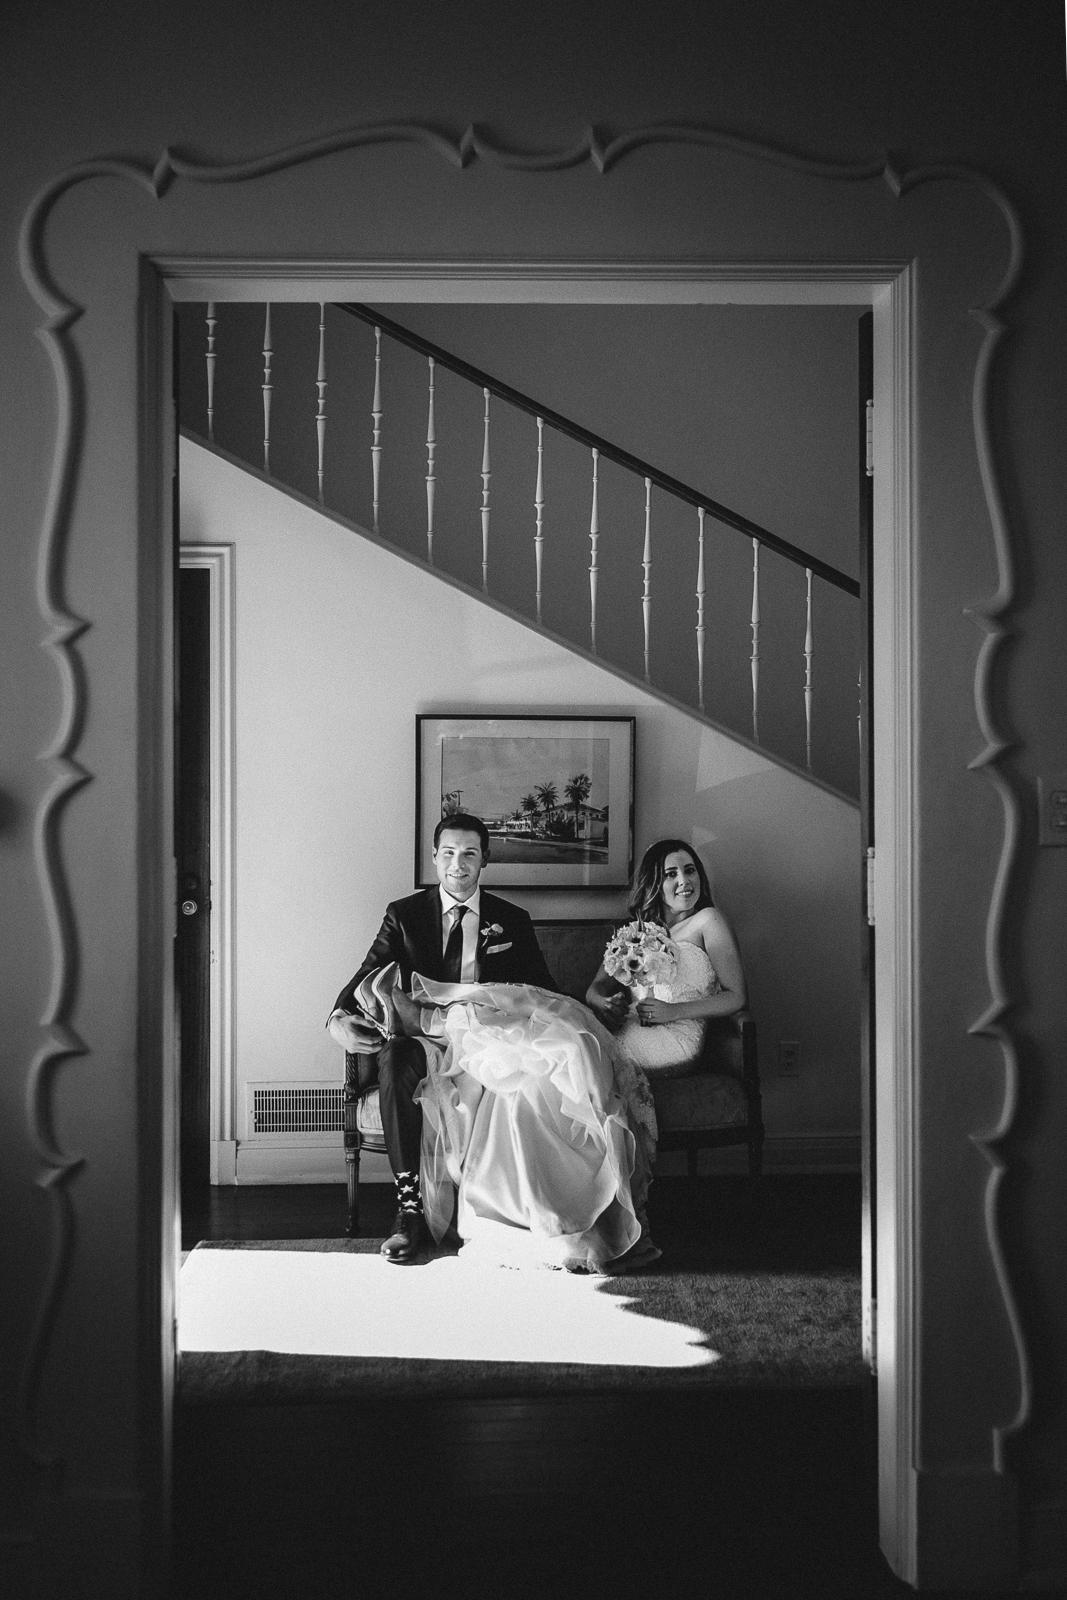 Amanda_&_Steve_Wedding_Darlington_House_La_Jolla_2015_IMG_6719.JPG